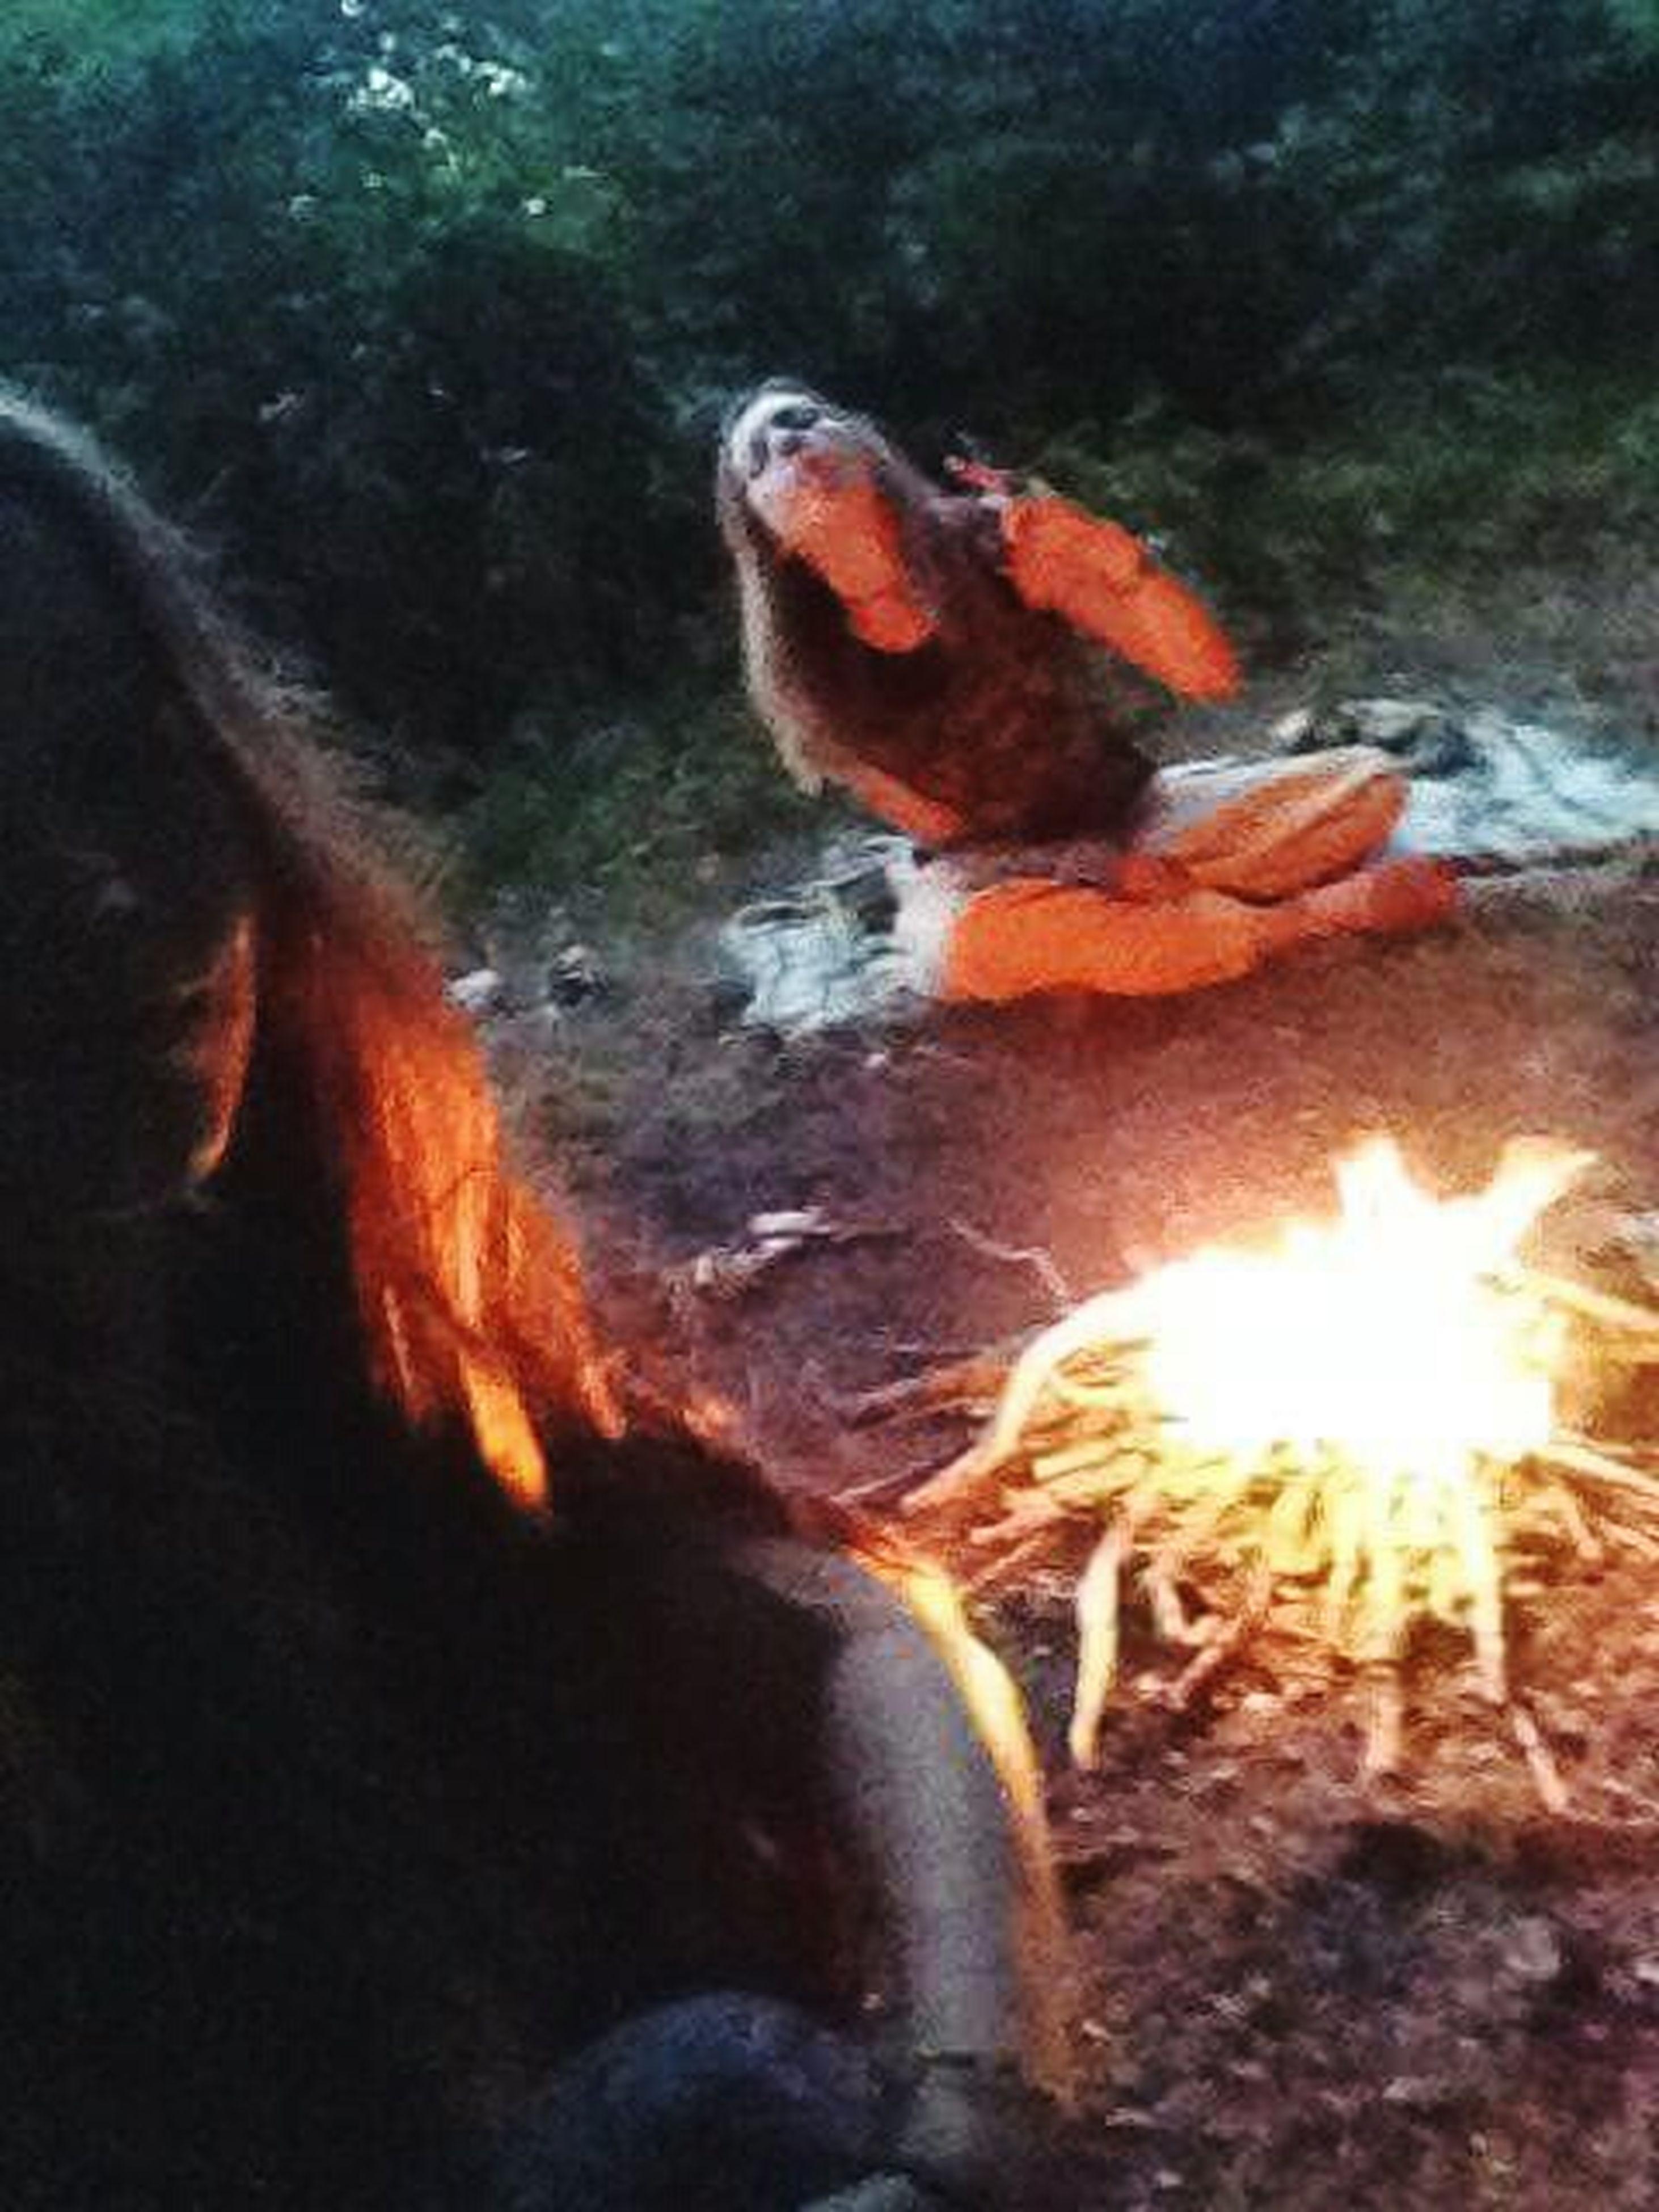 burning, flame, lifestyles, fire - natural phenomenon, leisure activity, orange color, heat - temperature, water, unrecognizable person, men, glowing, bonfire, sunlight, motion, nature, outdoors, standing